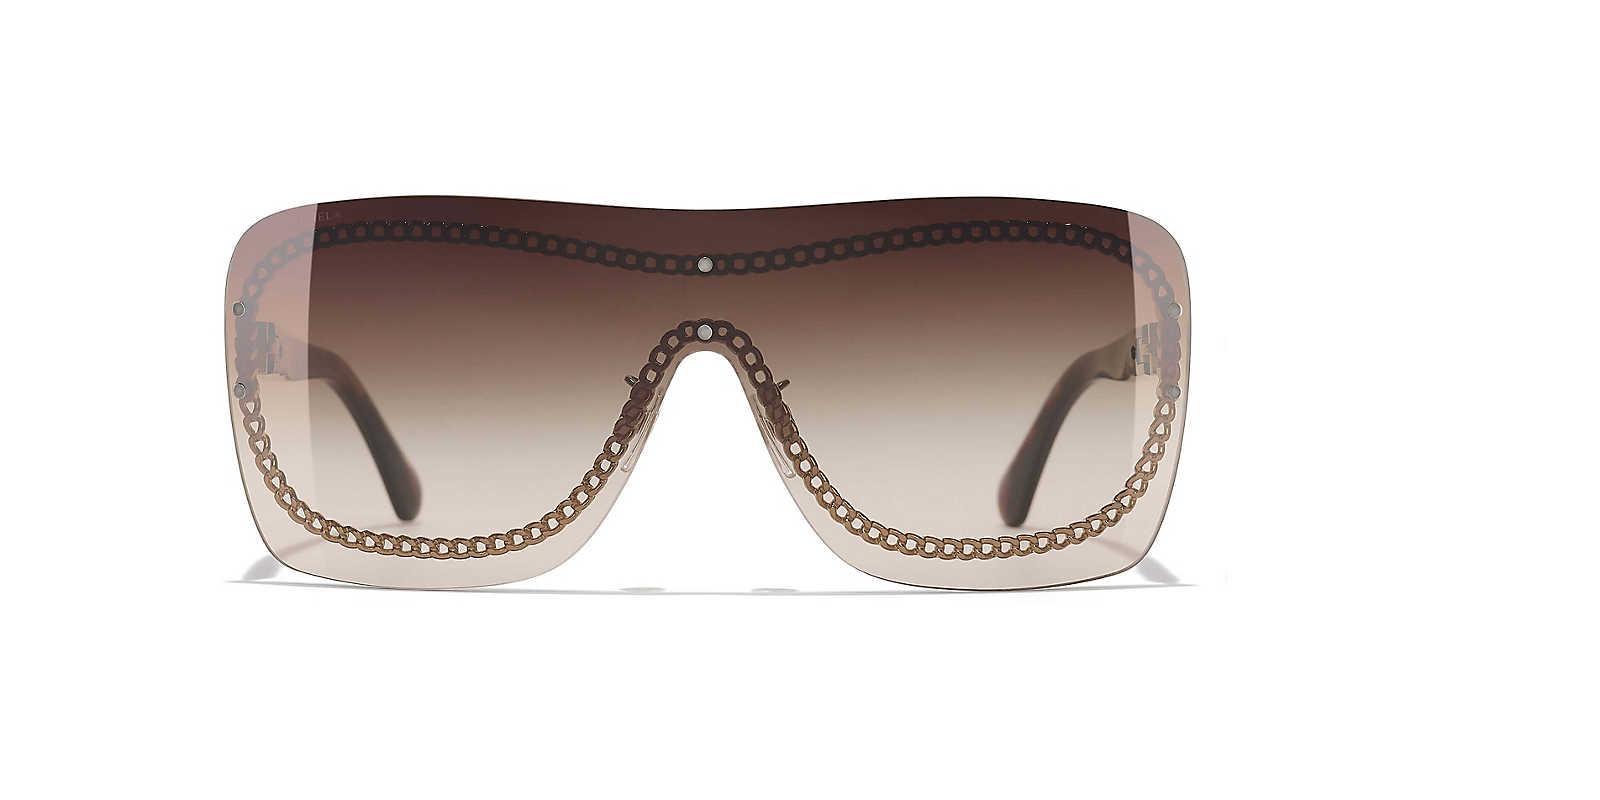 865a6291695e Chanel - Brown Sunglass Shield Sunglasses - Lyst. View fullscreen